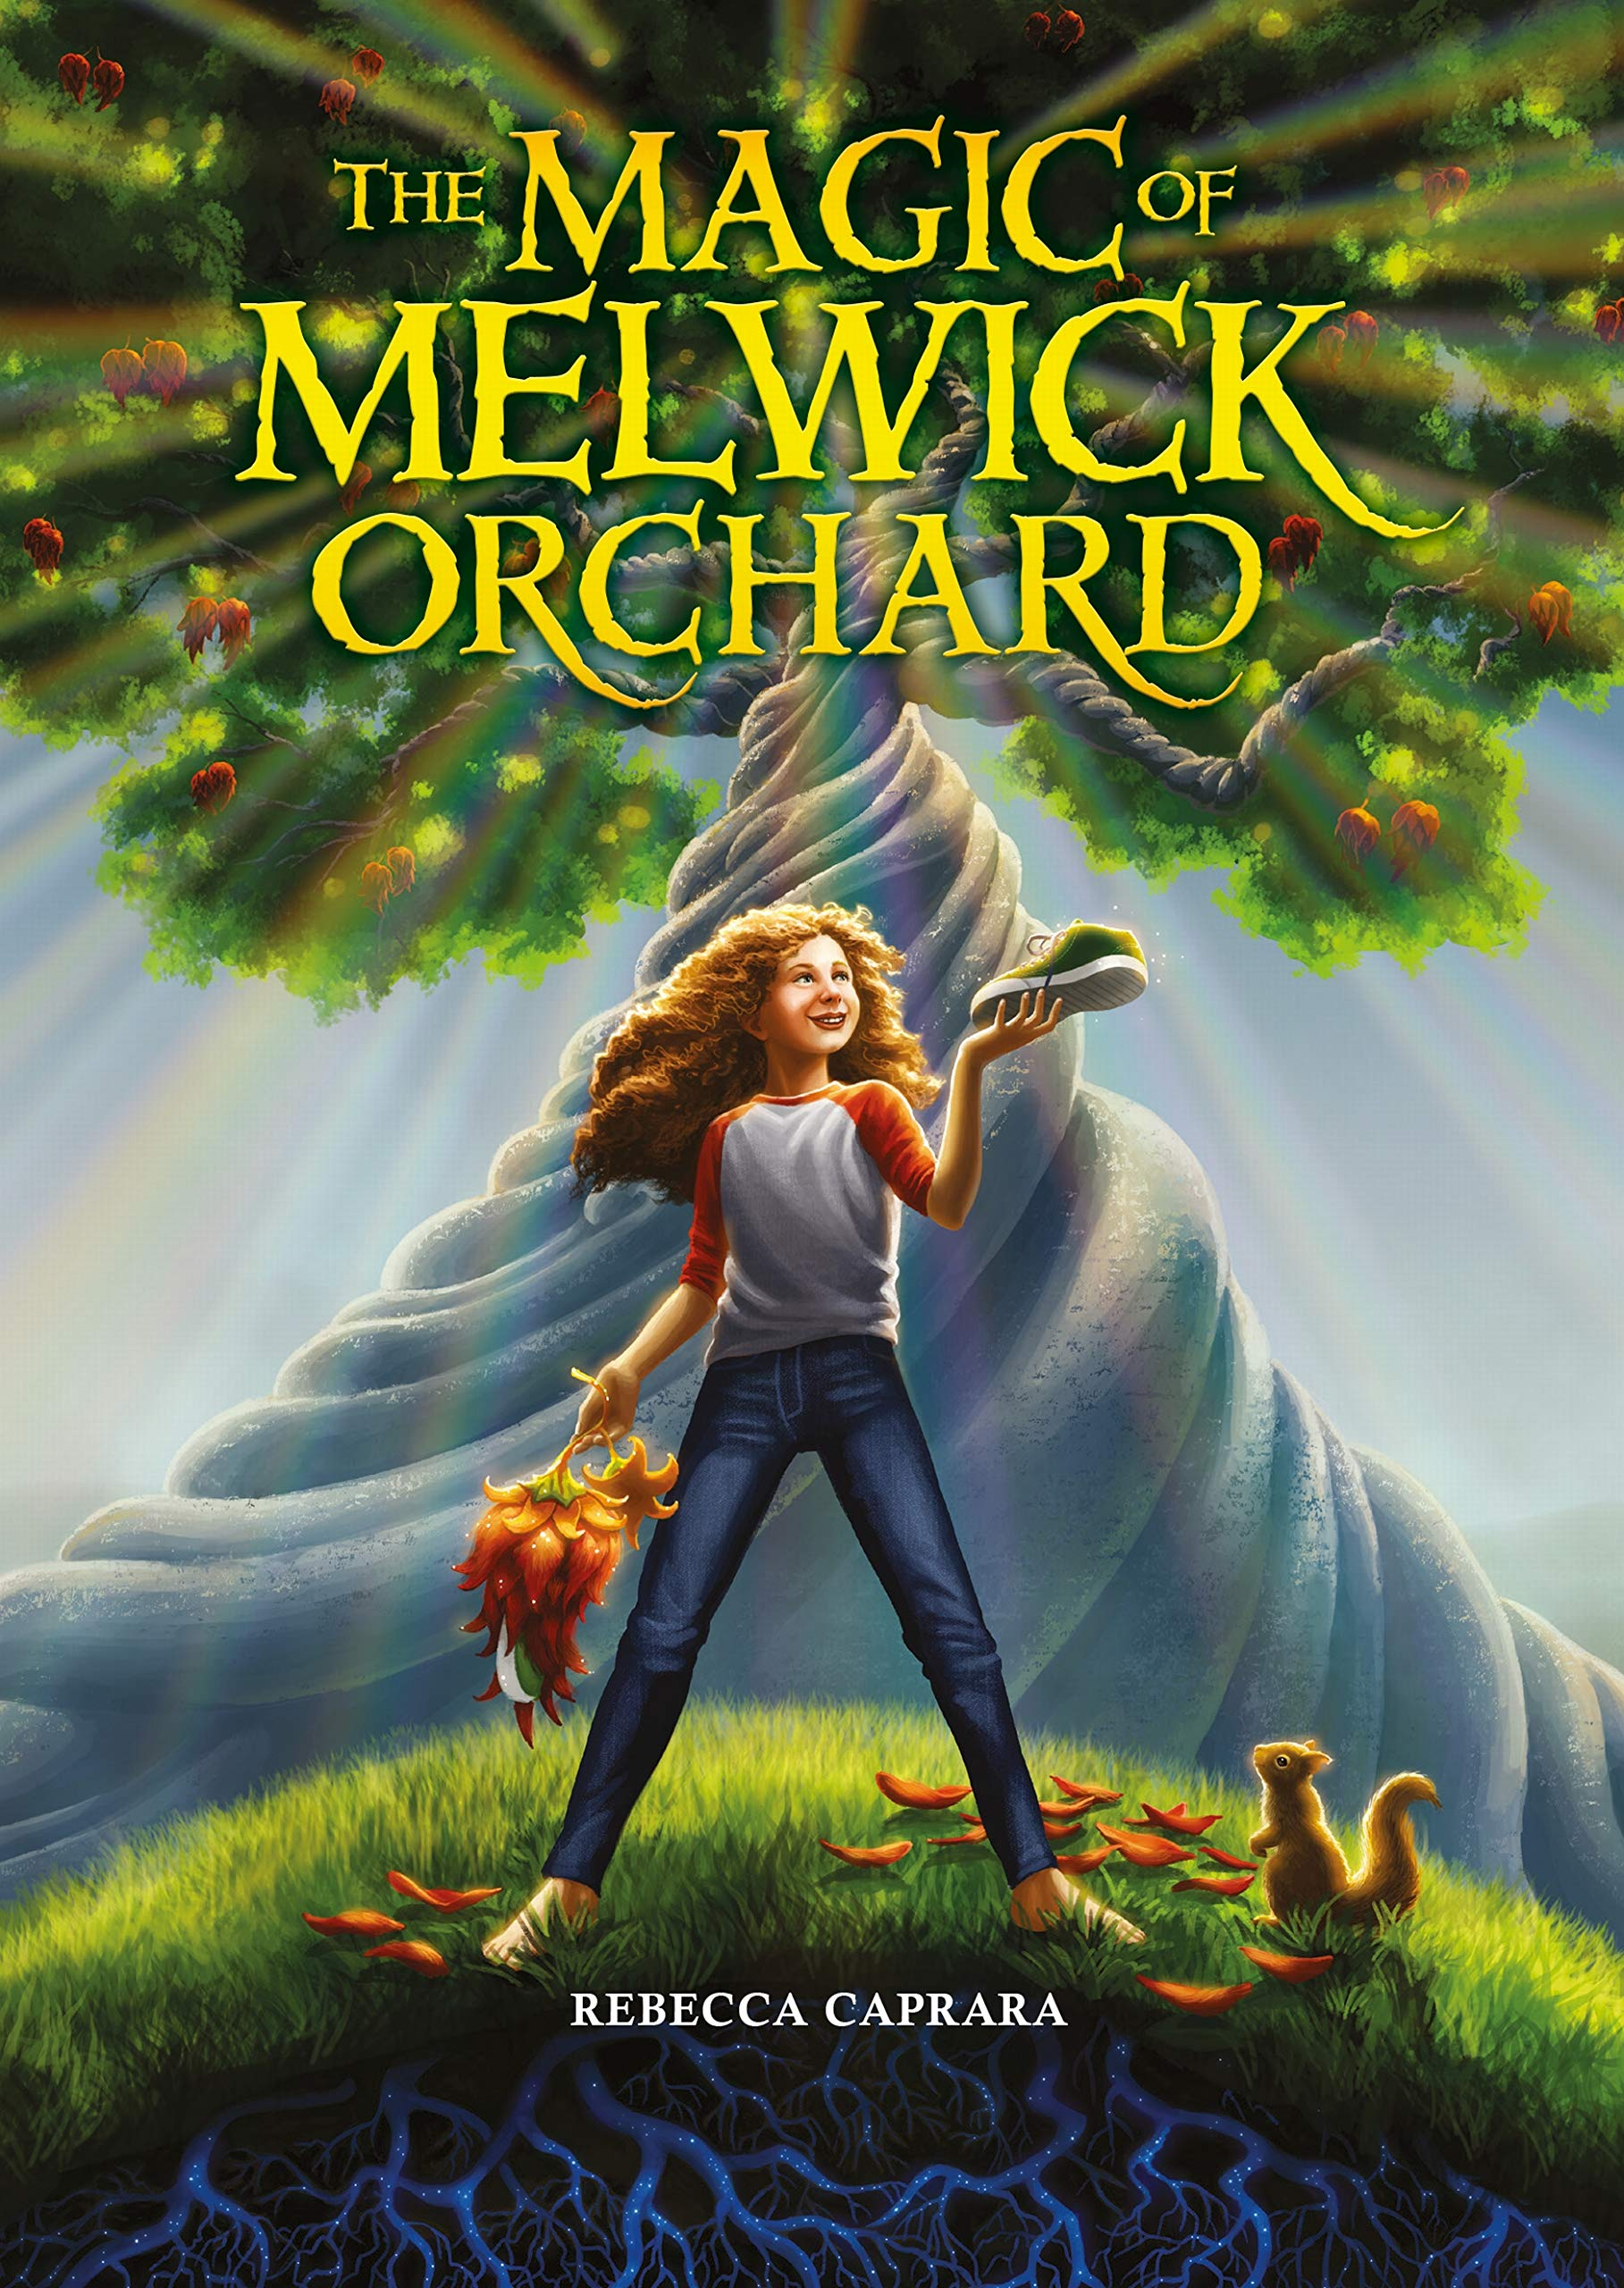 The Magic of Melwick Orchard: Caprara, Rebecca: 9781512466874: Amazon.com:  Books